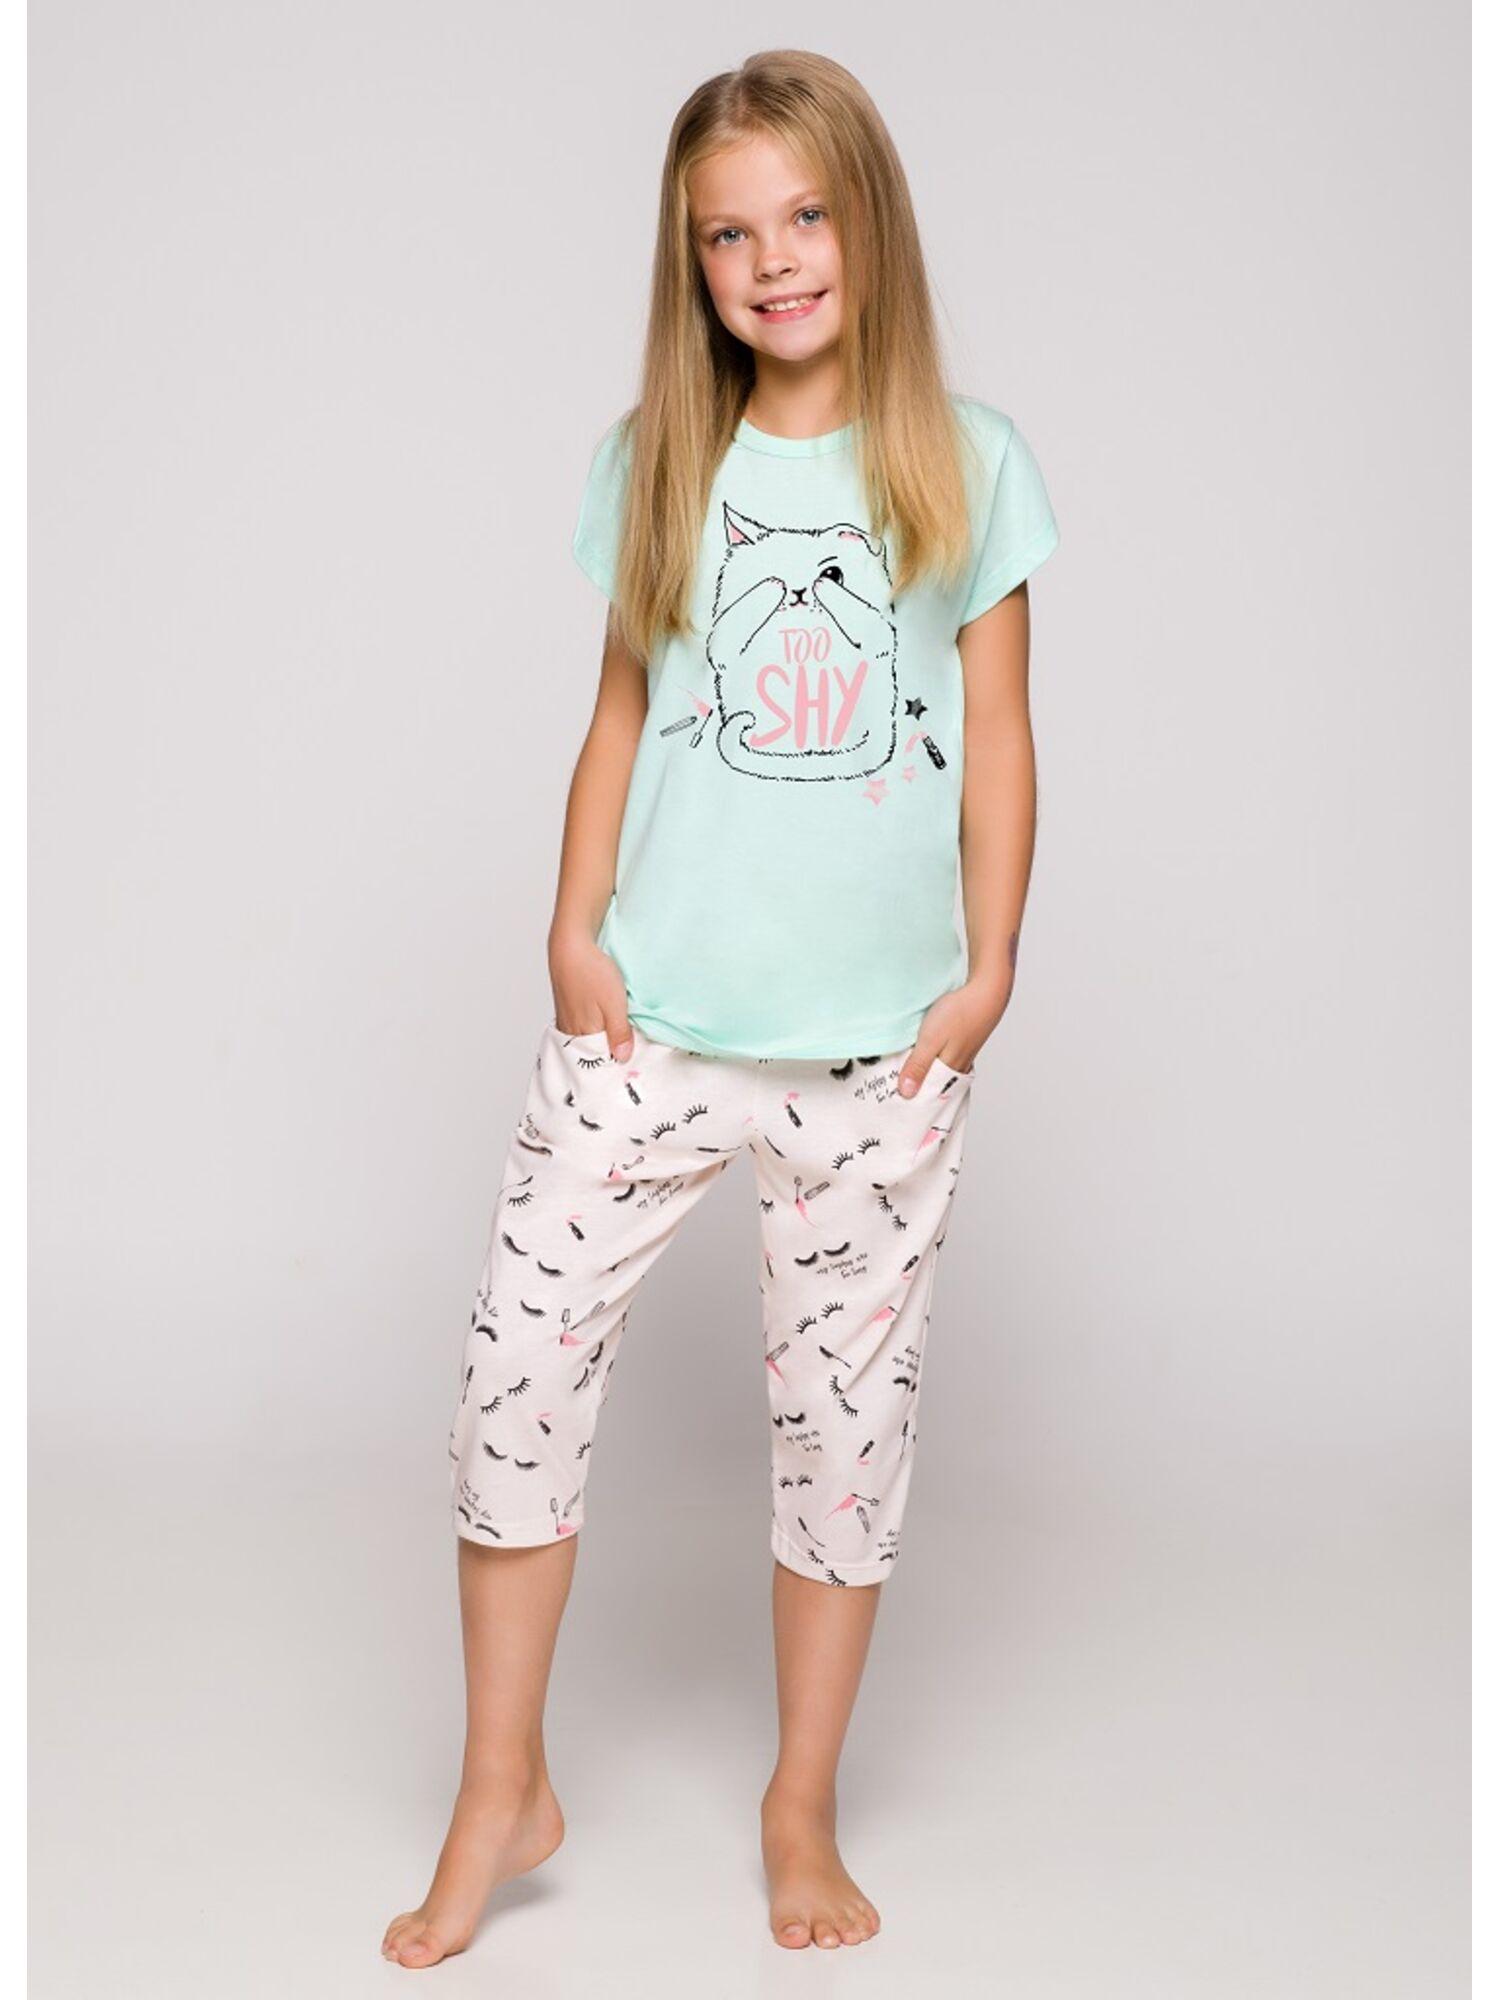 Пижама детская 2213/2214 19 Beki мята